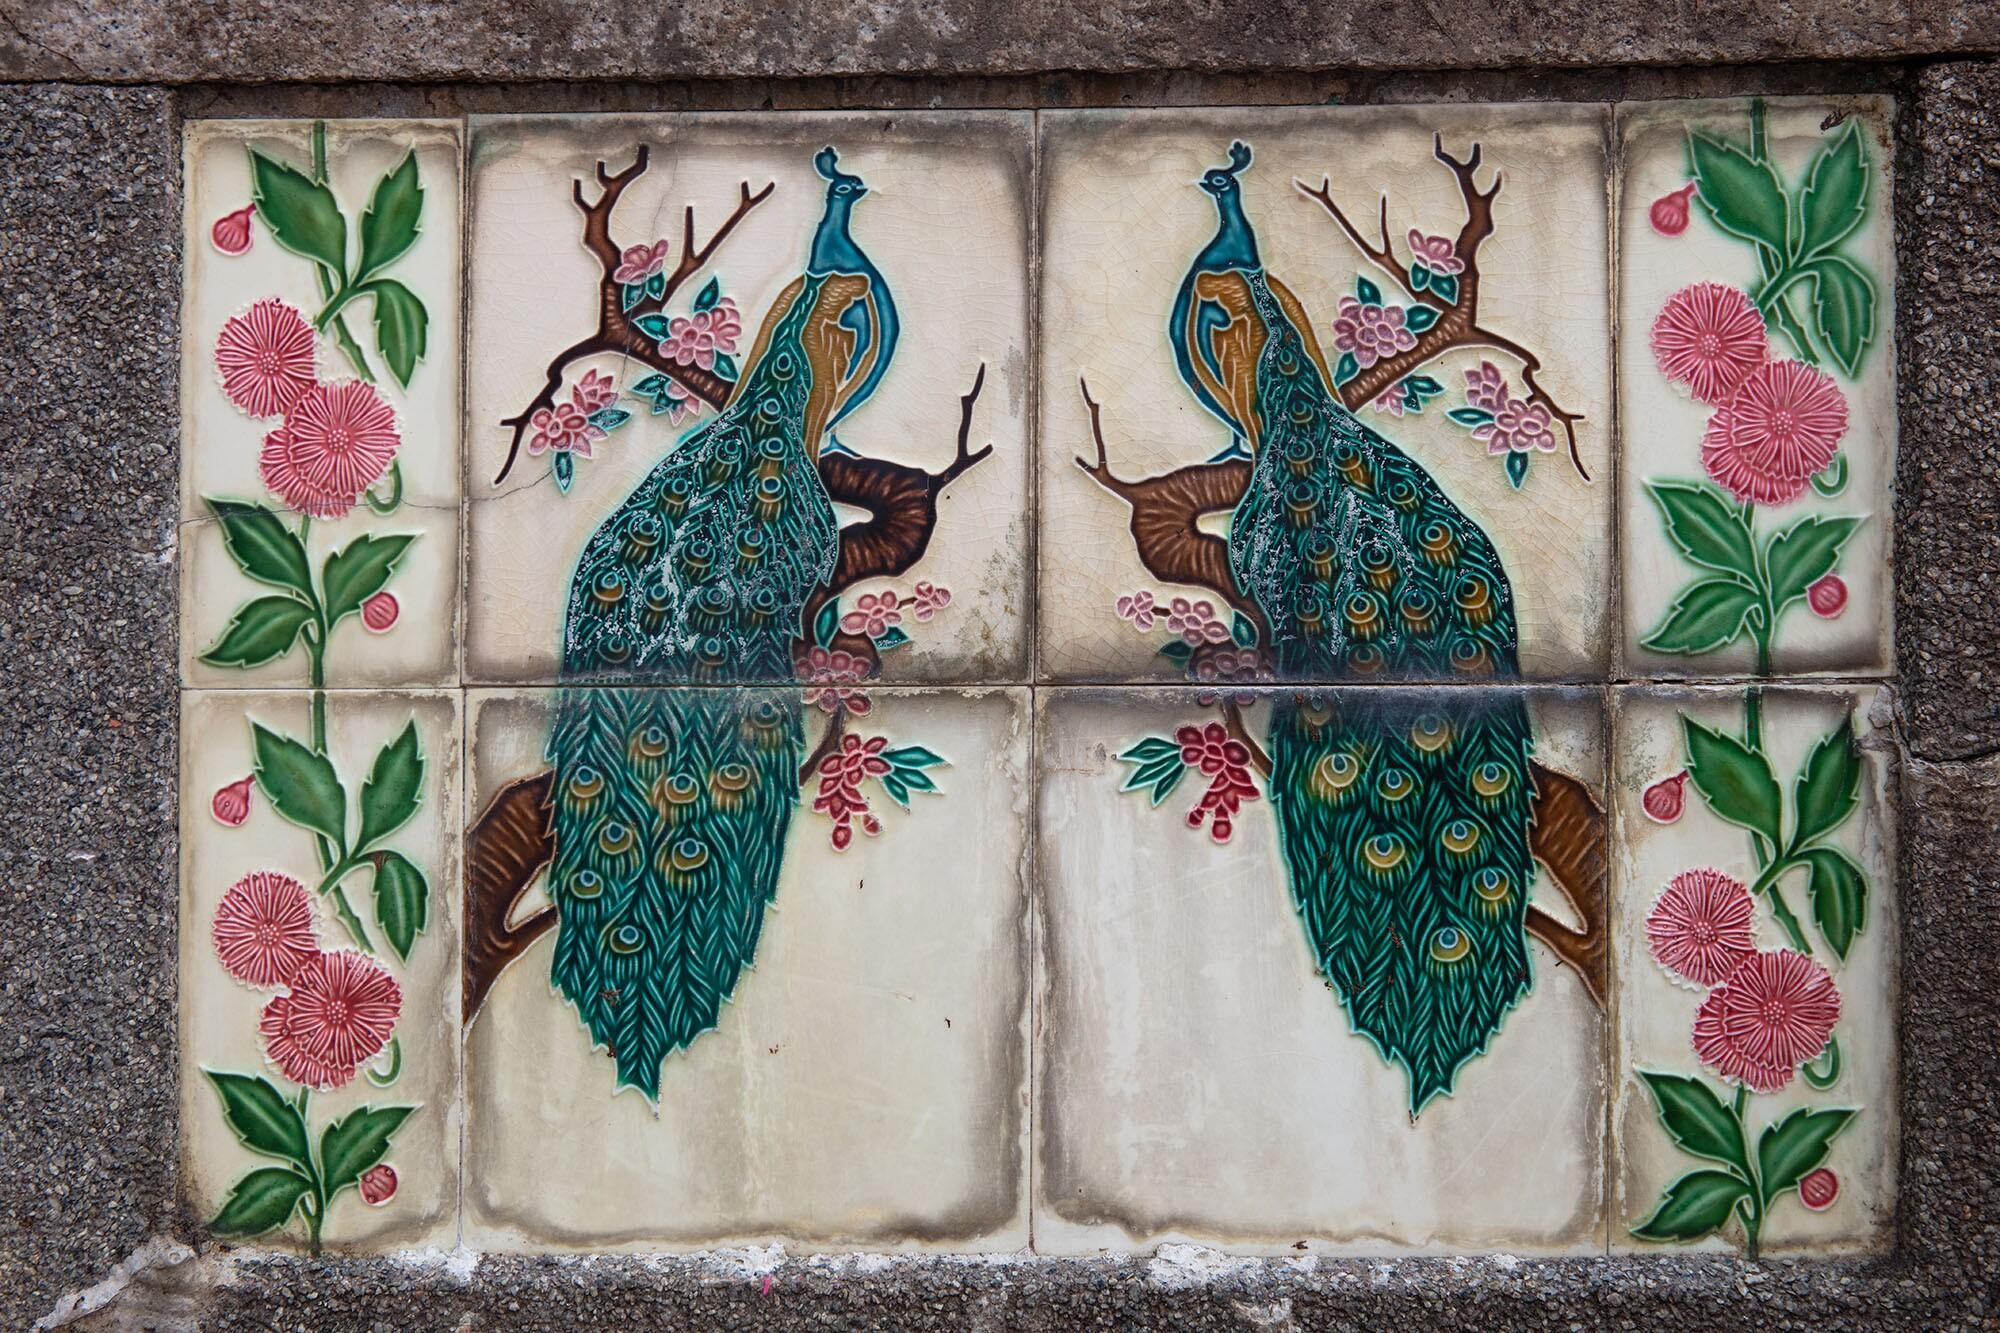 Decorative tiles at Bukit Brown Cemetery